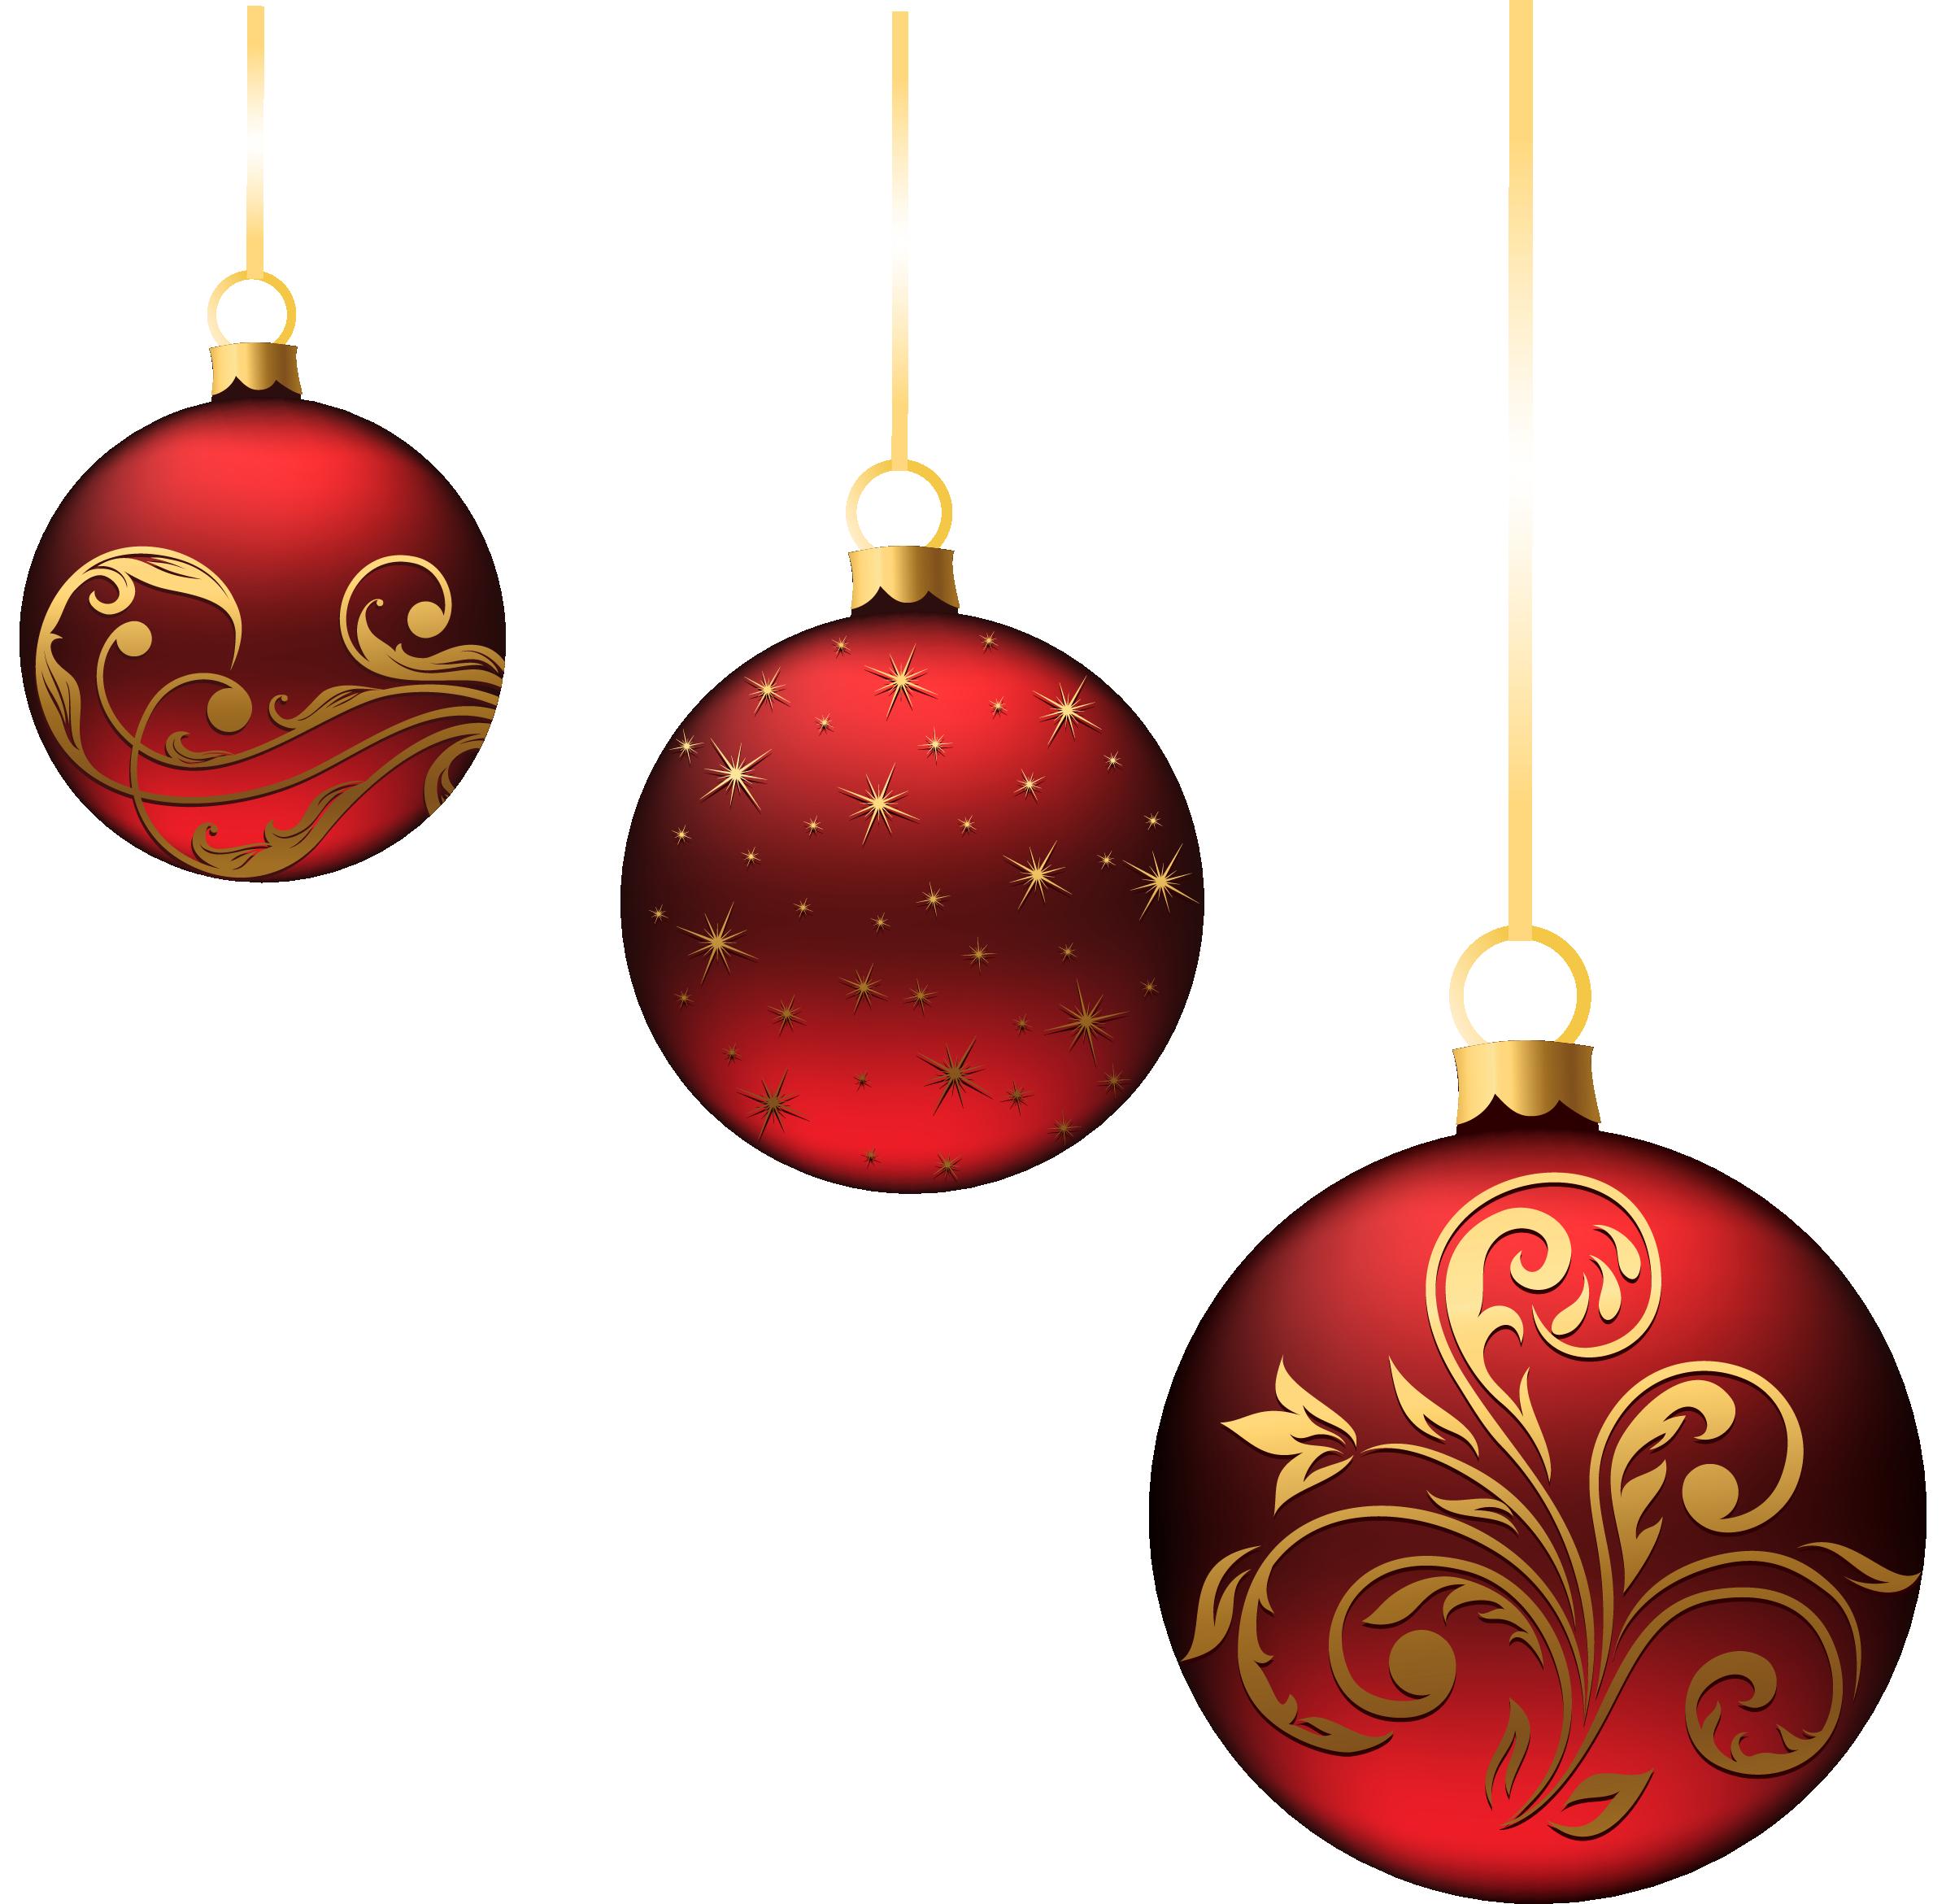 Christmas red balls ornaments. Grinch clipart broken ornament